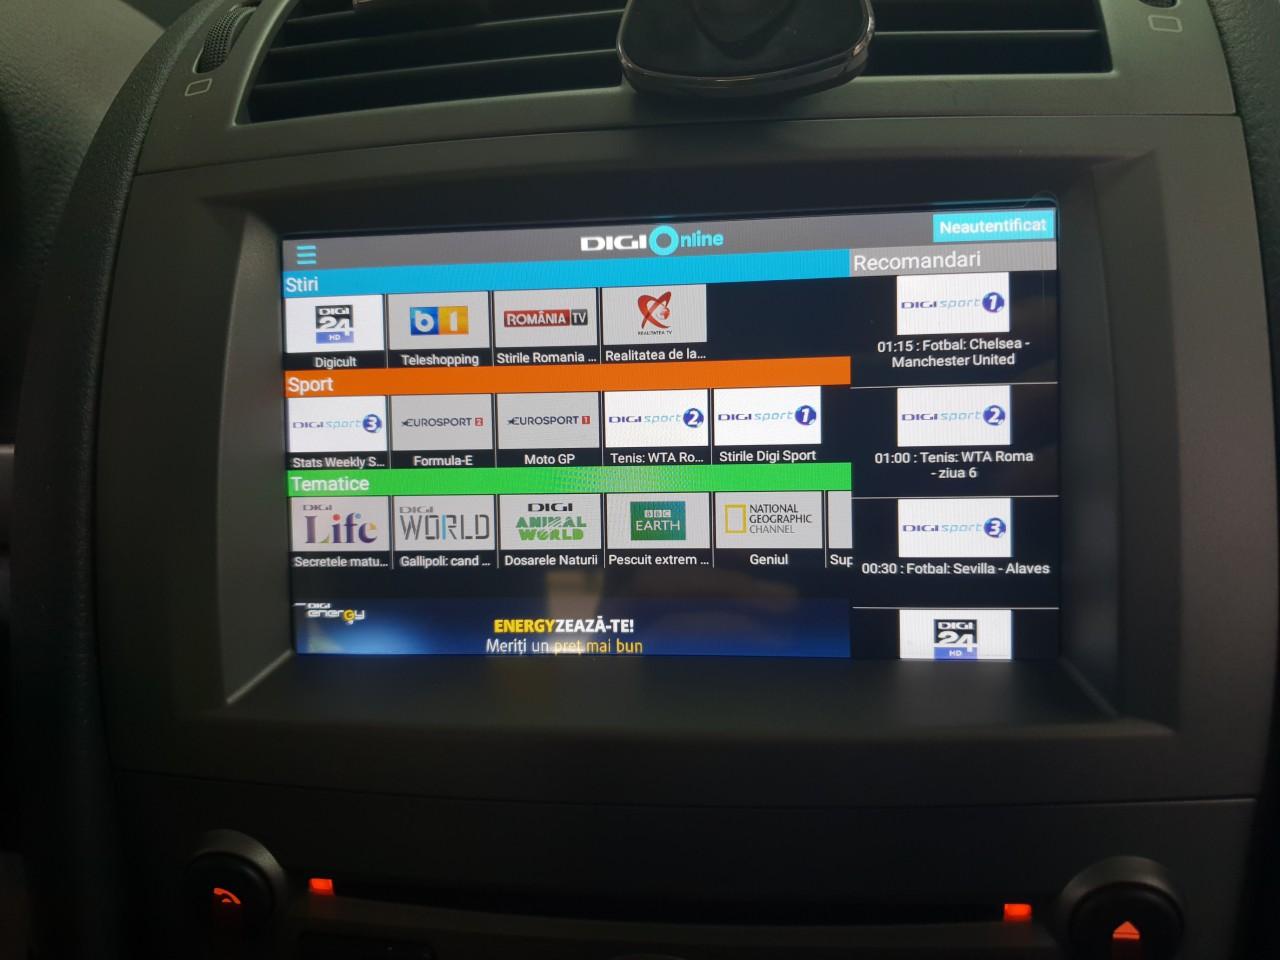 NAVIGATIE ANDROID 8.0 DEDICATA PEUGEOT 407 WITSON W2-V5588 INTERNET 4G WIFI OCTA CORE PX5 GPS WAZE